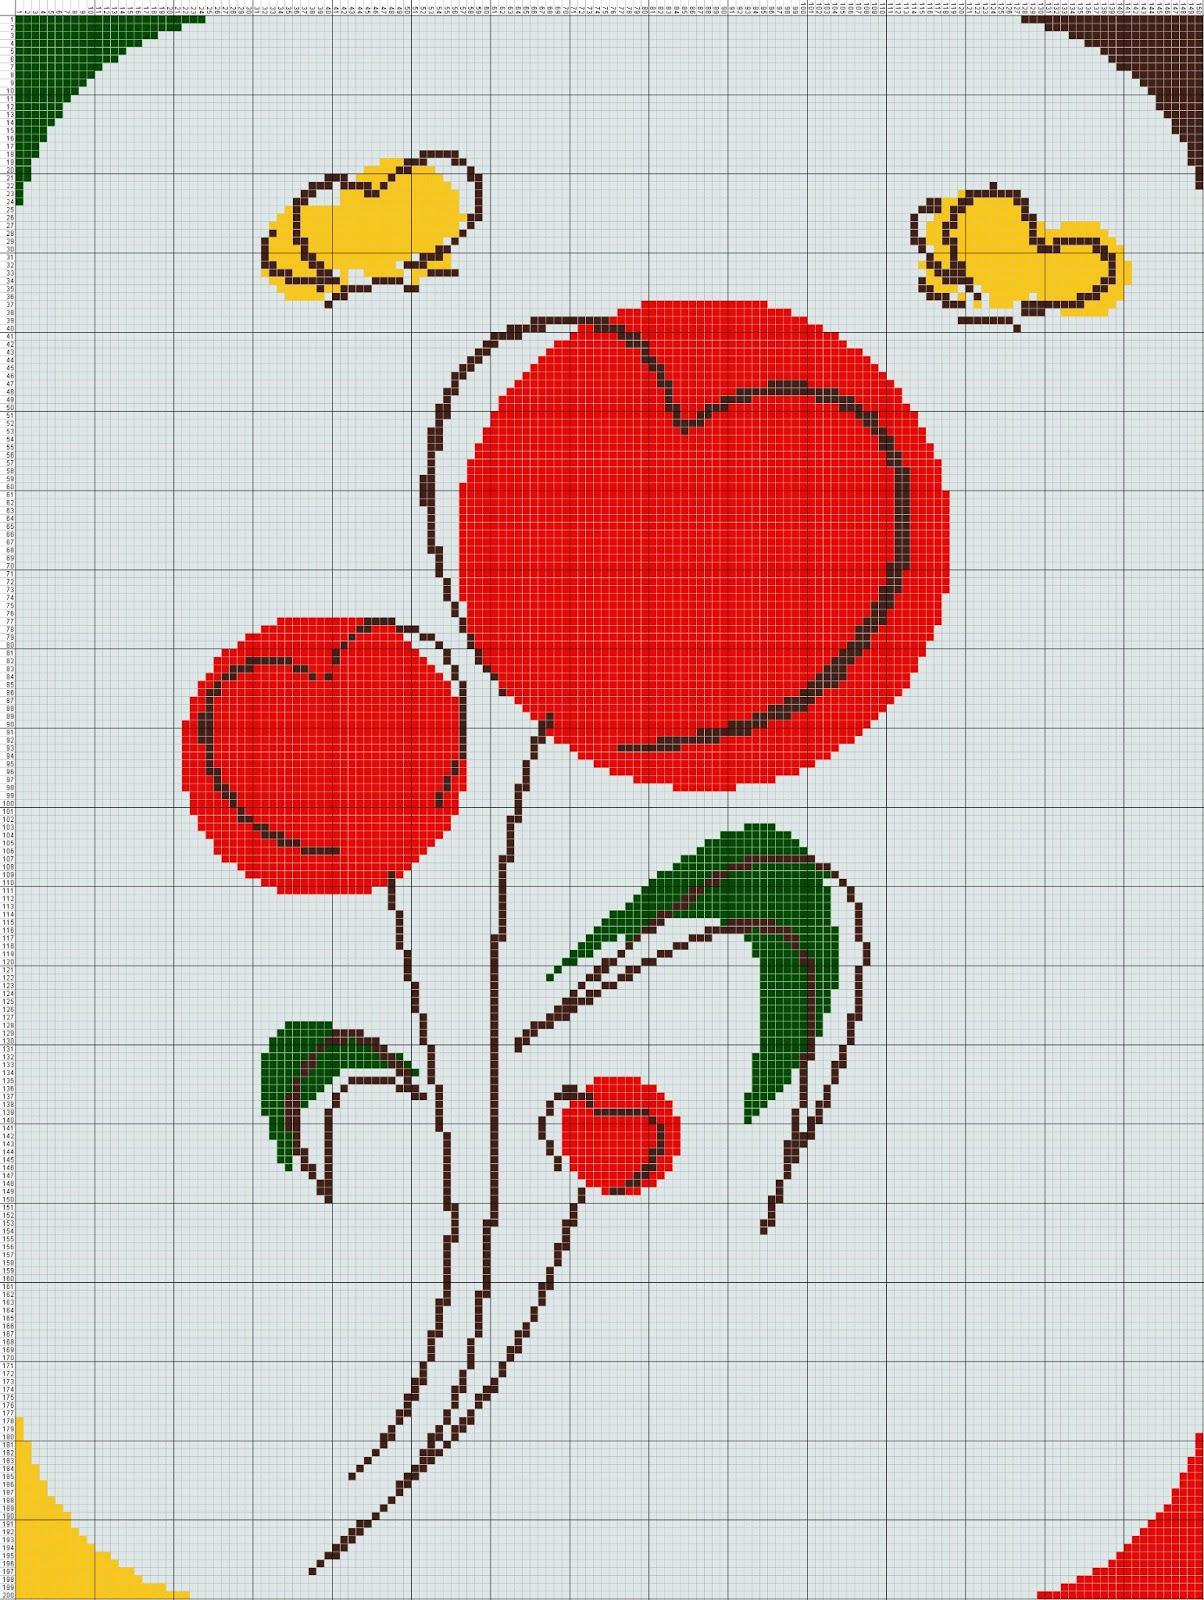 Gambar Pola Kristik Bunga Merah dan Kupu-Kupu